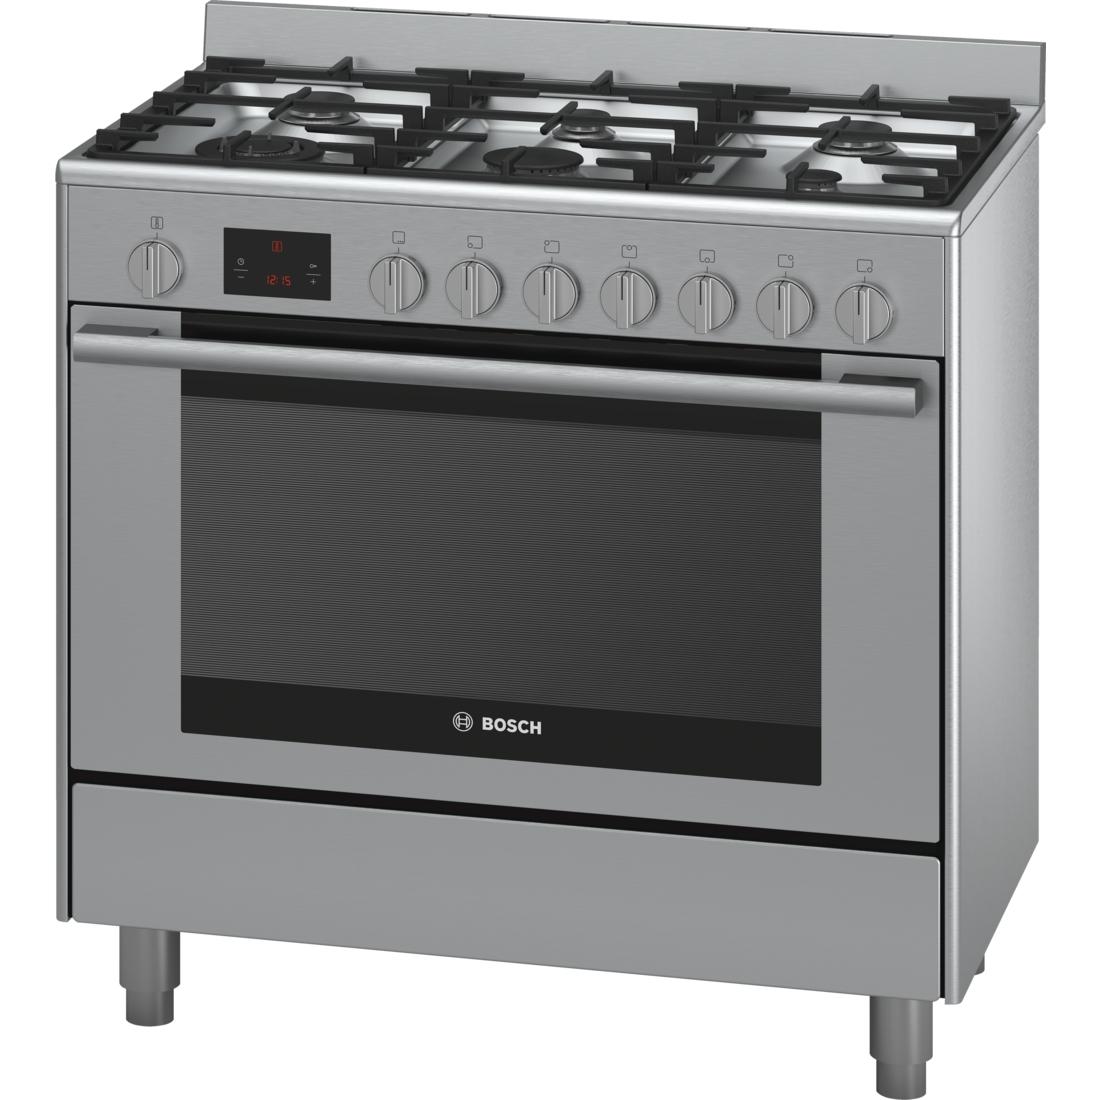 bosch 90cm series 6 112l dual fuel freestanding oven stove hsb738357a ebay. Black Bedroom Furniture Sets. Home Design Ideas